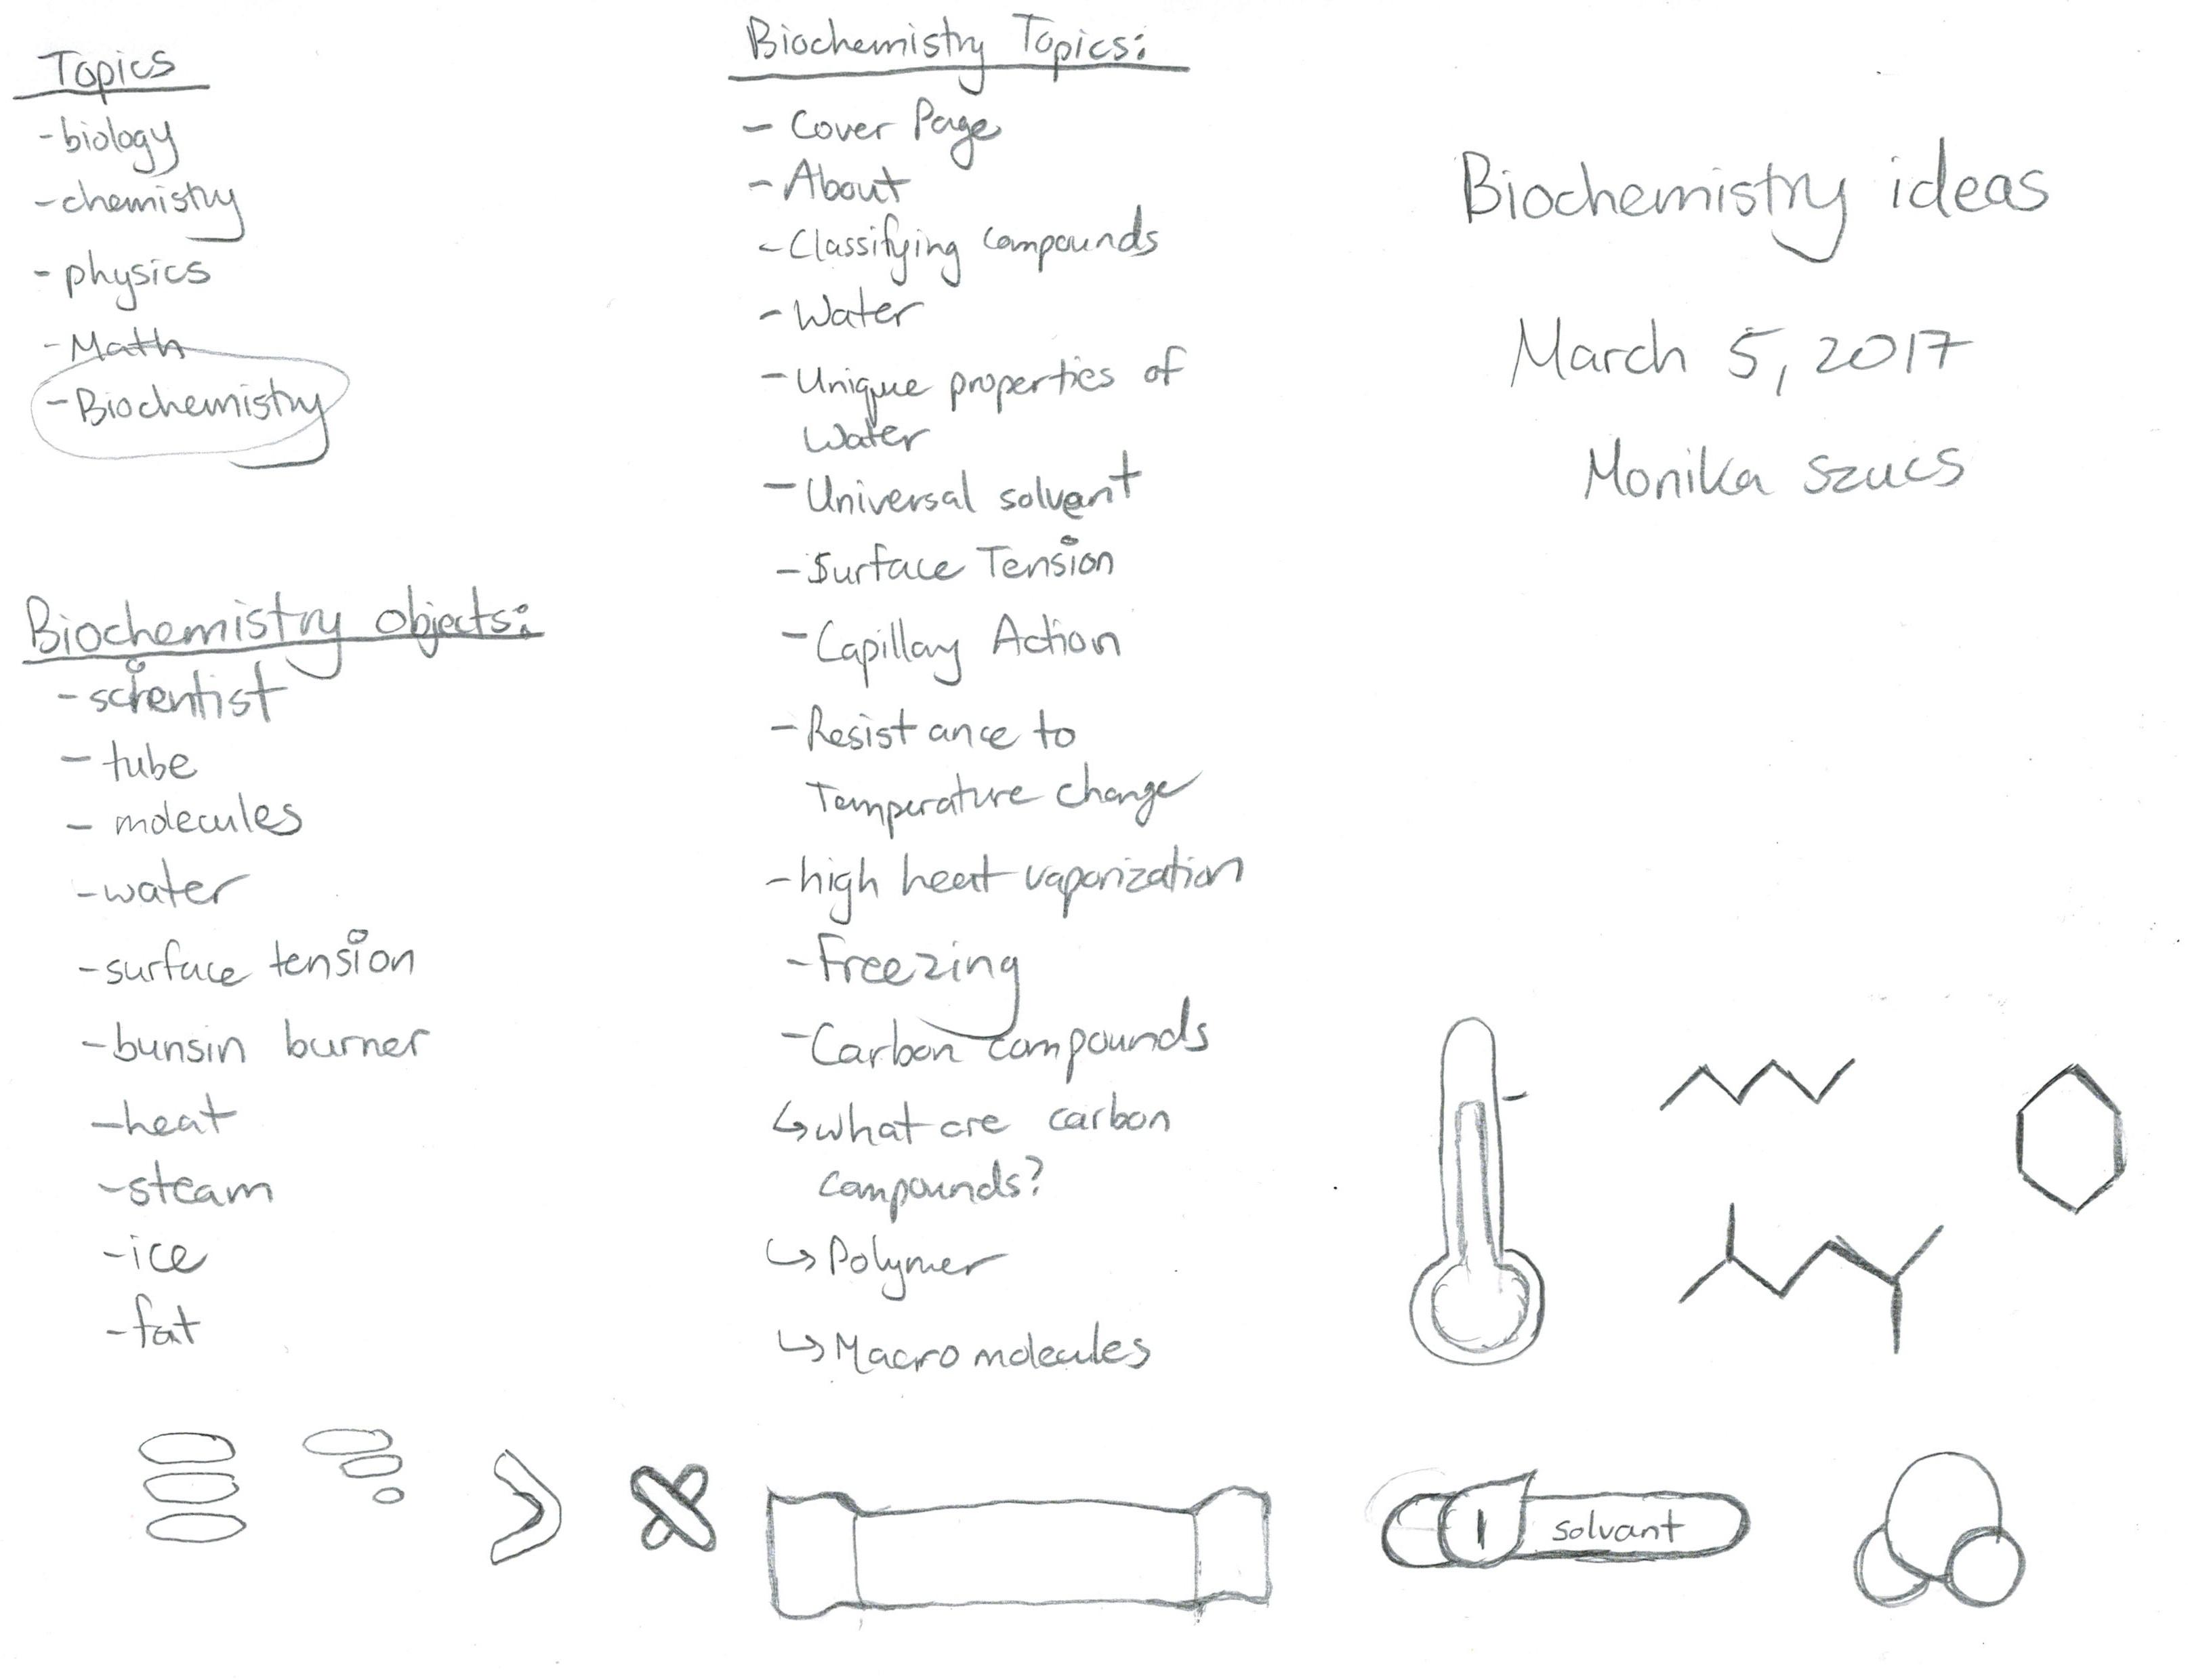 Biochemistry Study Guide Graphic Design Epub, Monika Szucs